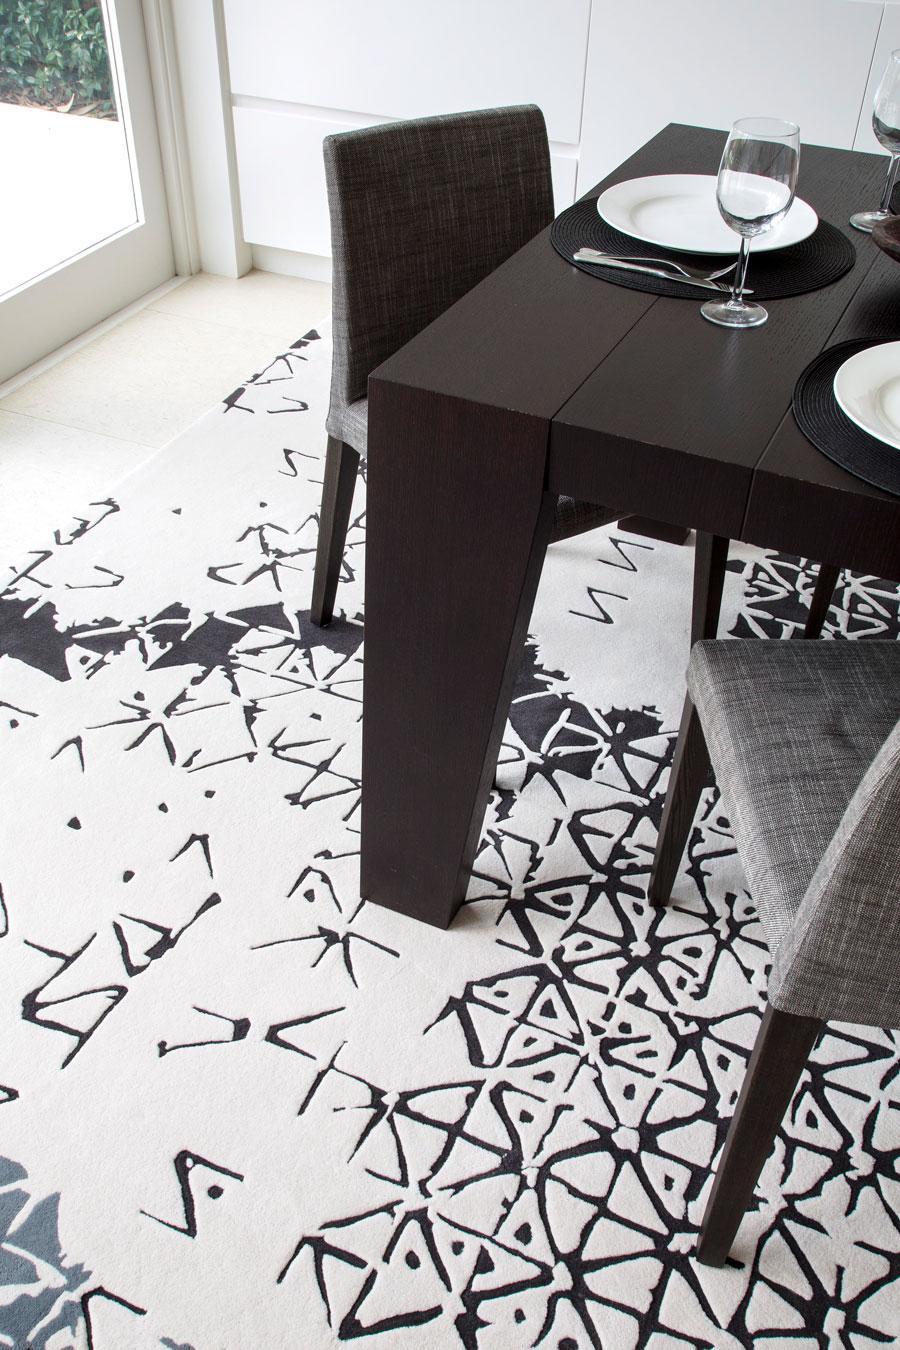 close up of batik ubud rug by akira in white black and grey pattern